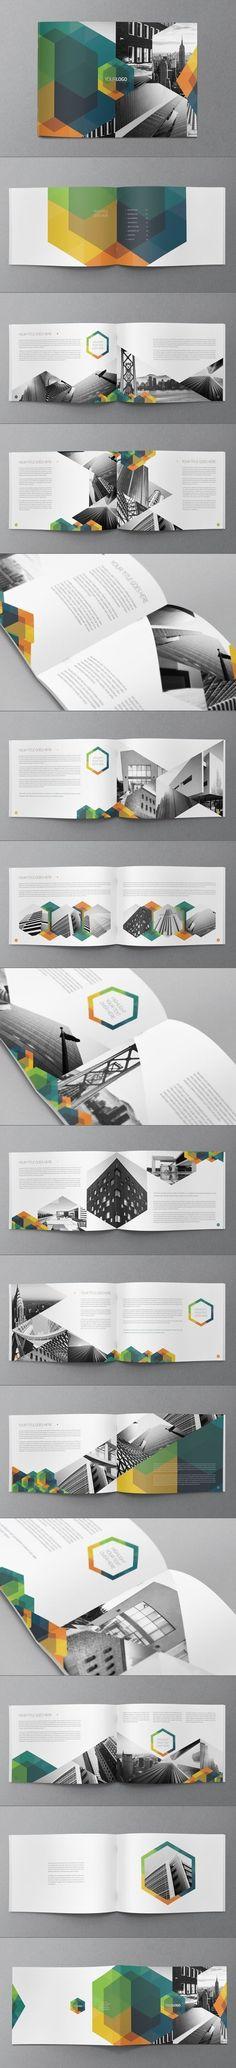 Hexo Brochure Design by Abra Design | Graphic Design in Catalog